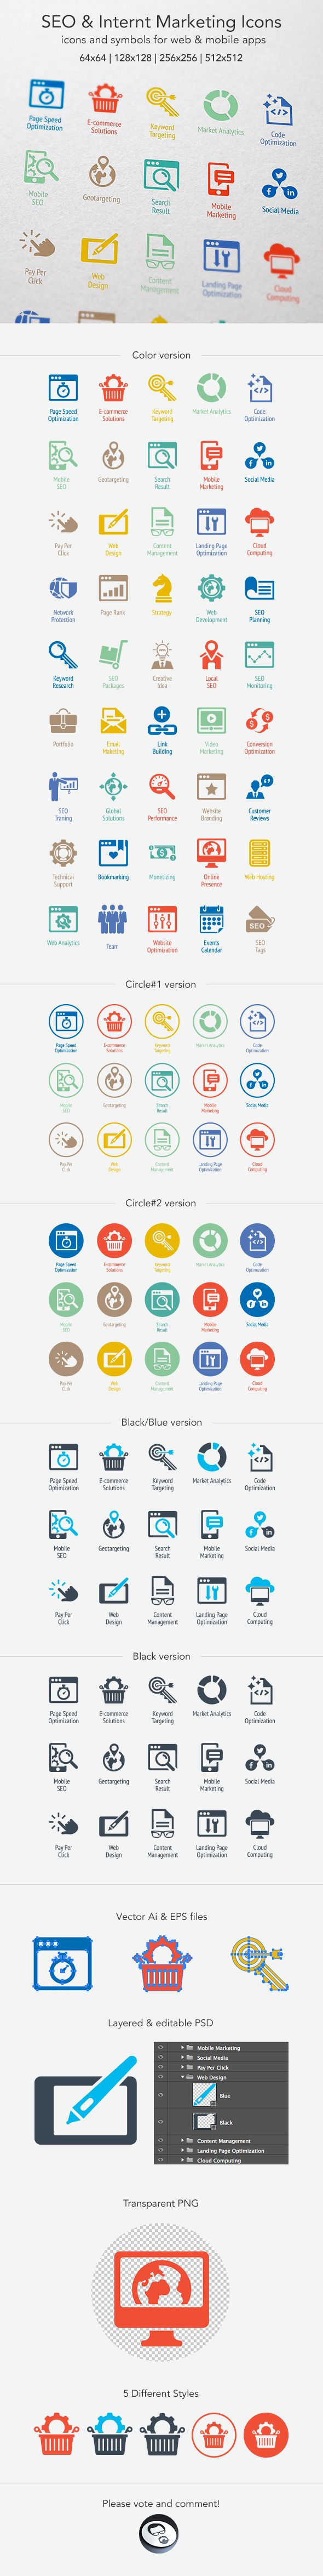 SEO & Internet Marketing Icons by Artem Ottoson, via Behance